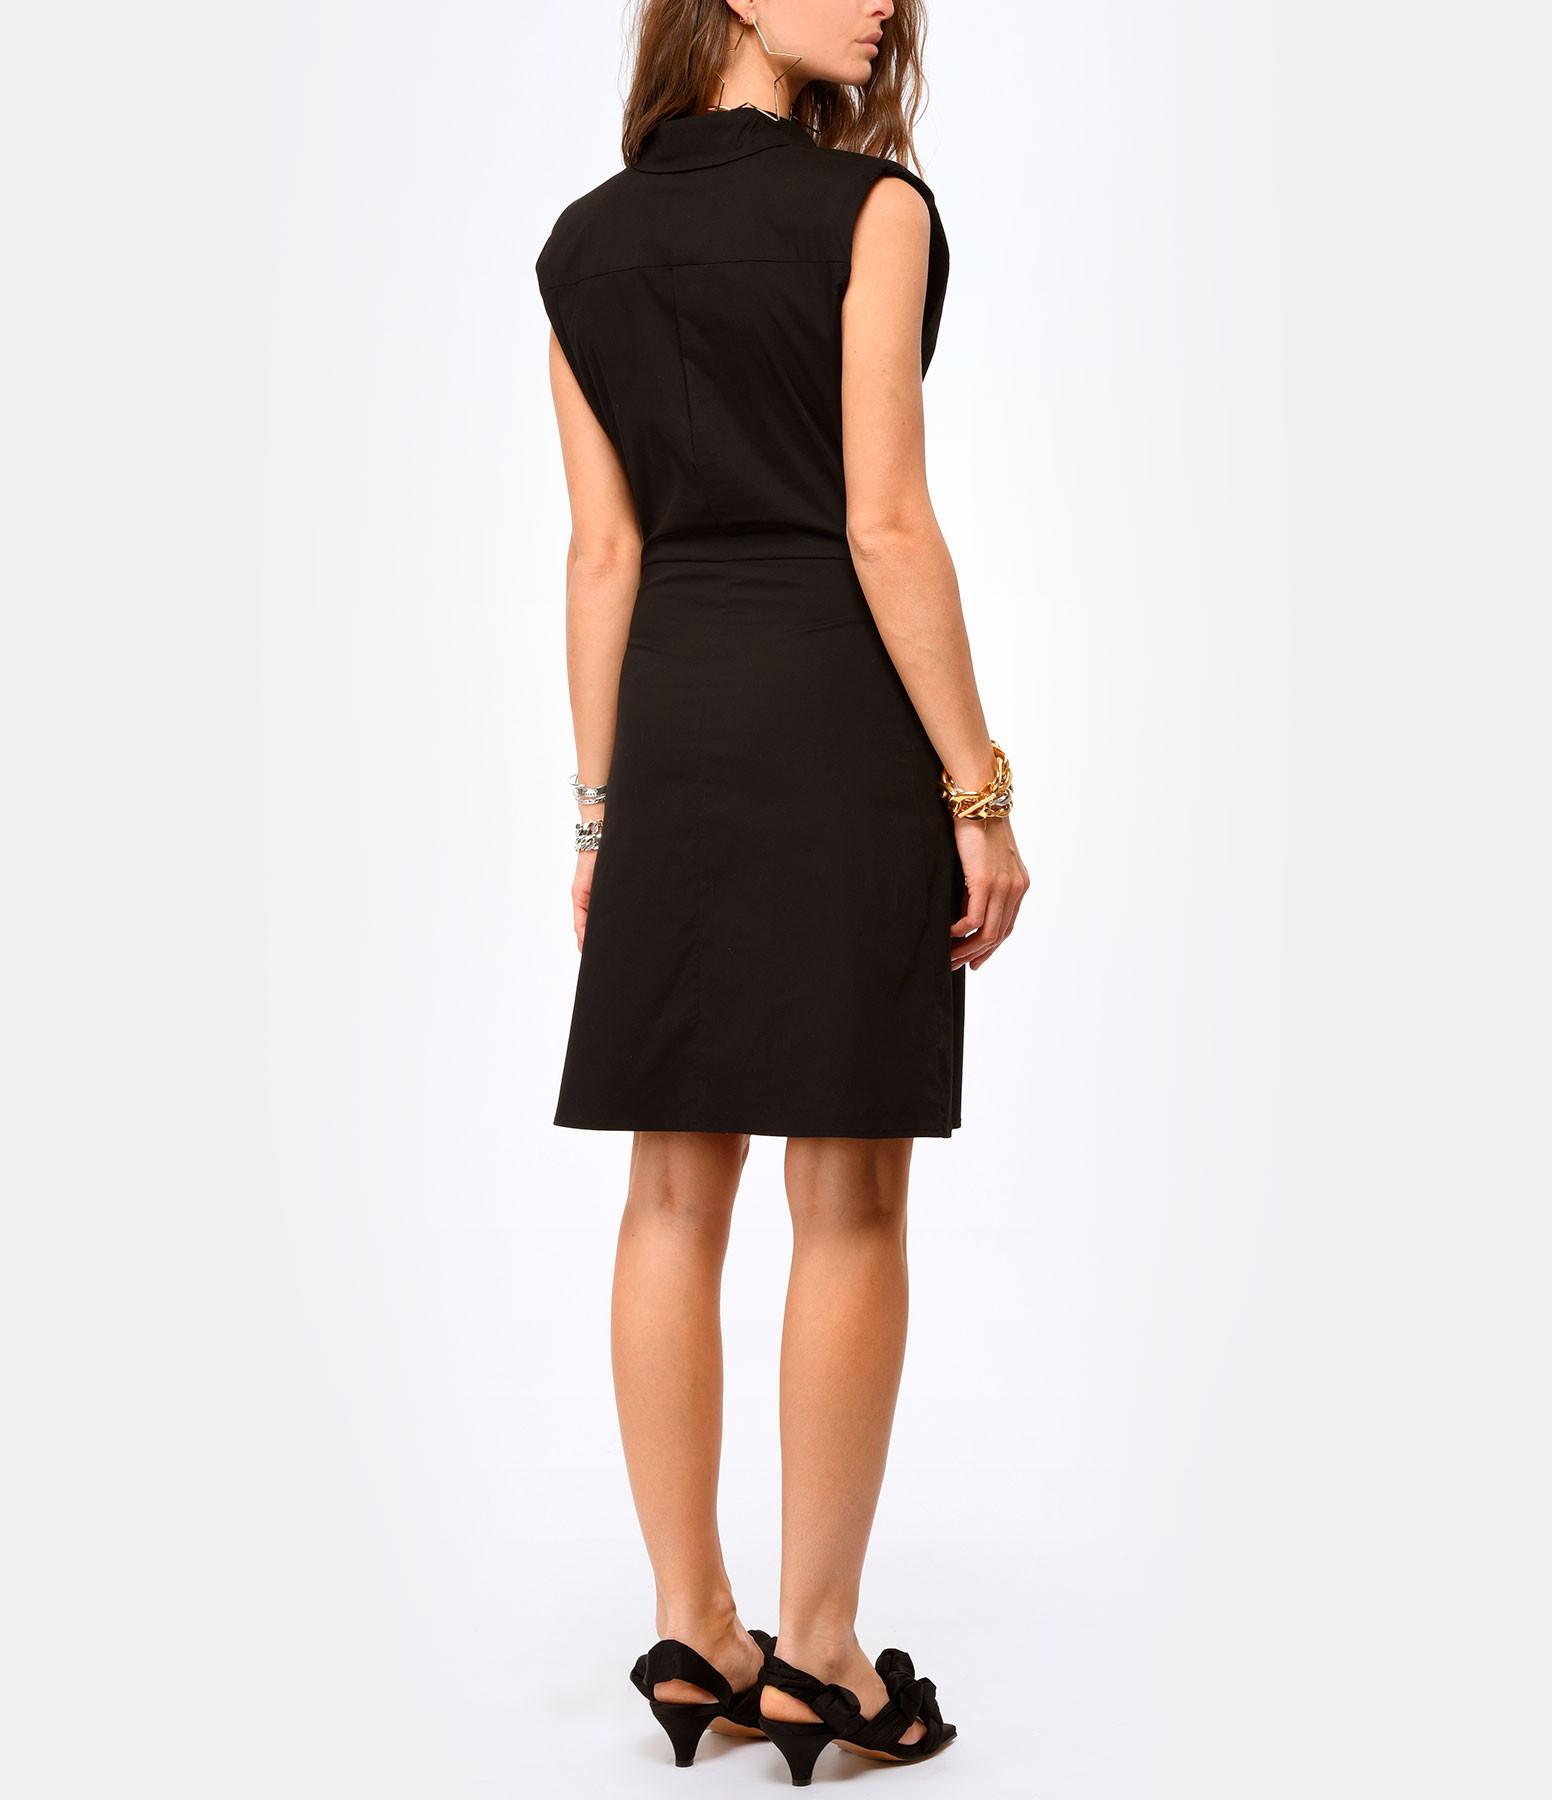 SEASONS - Robe Coton Noir